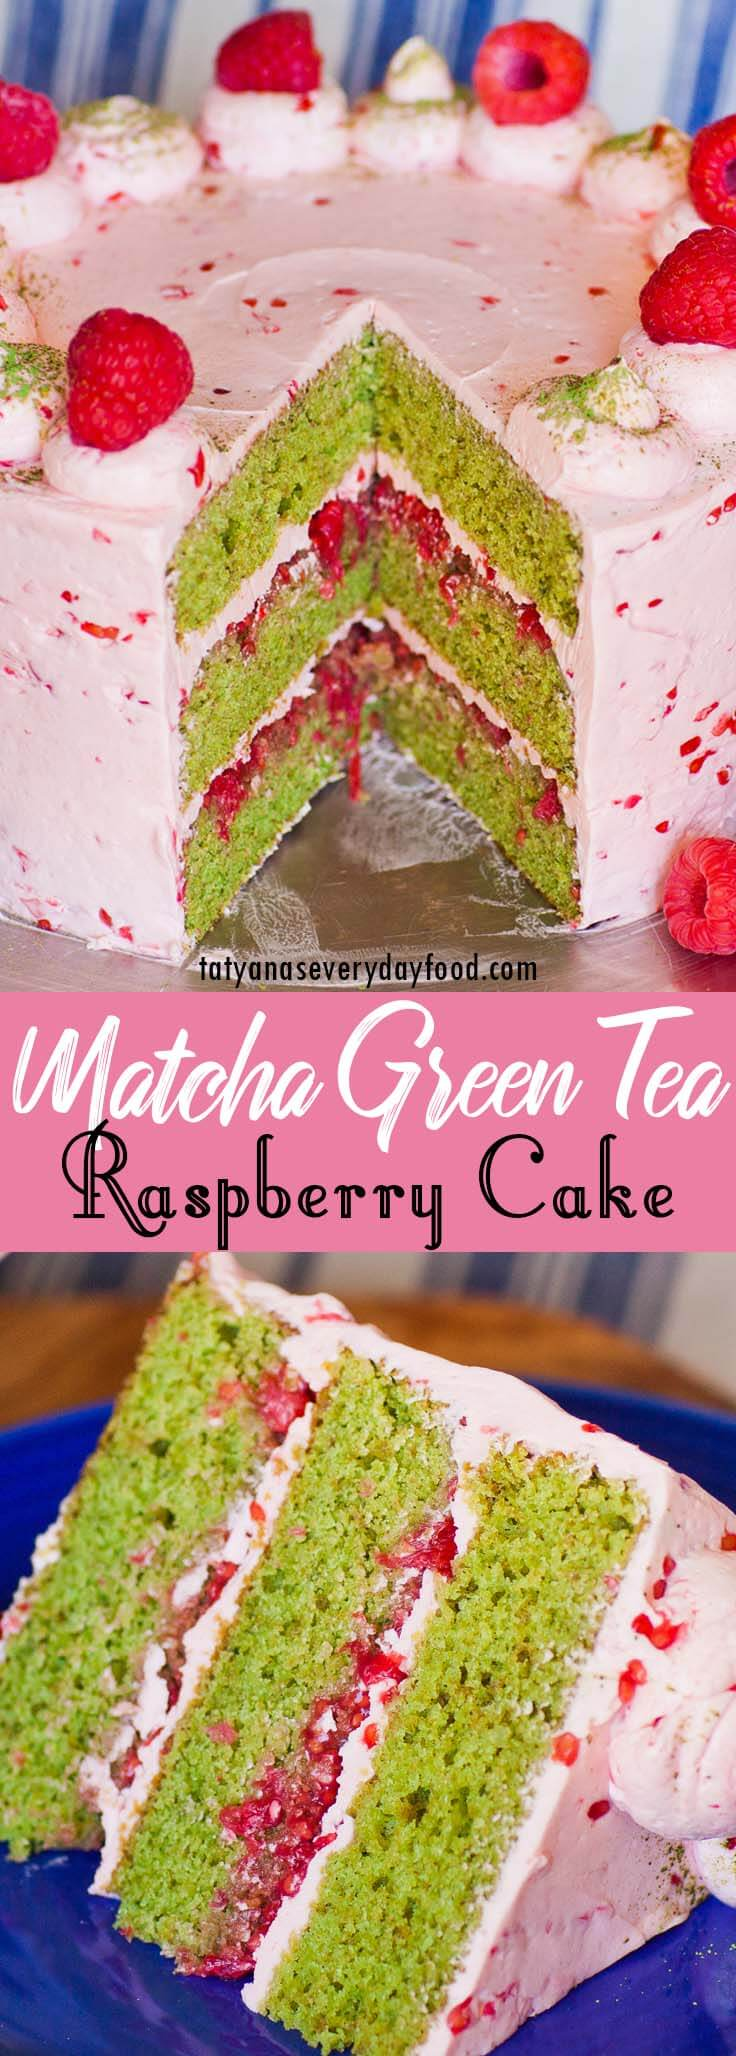 Match Green Tea Raspberry Cake video recipe